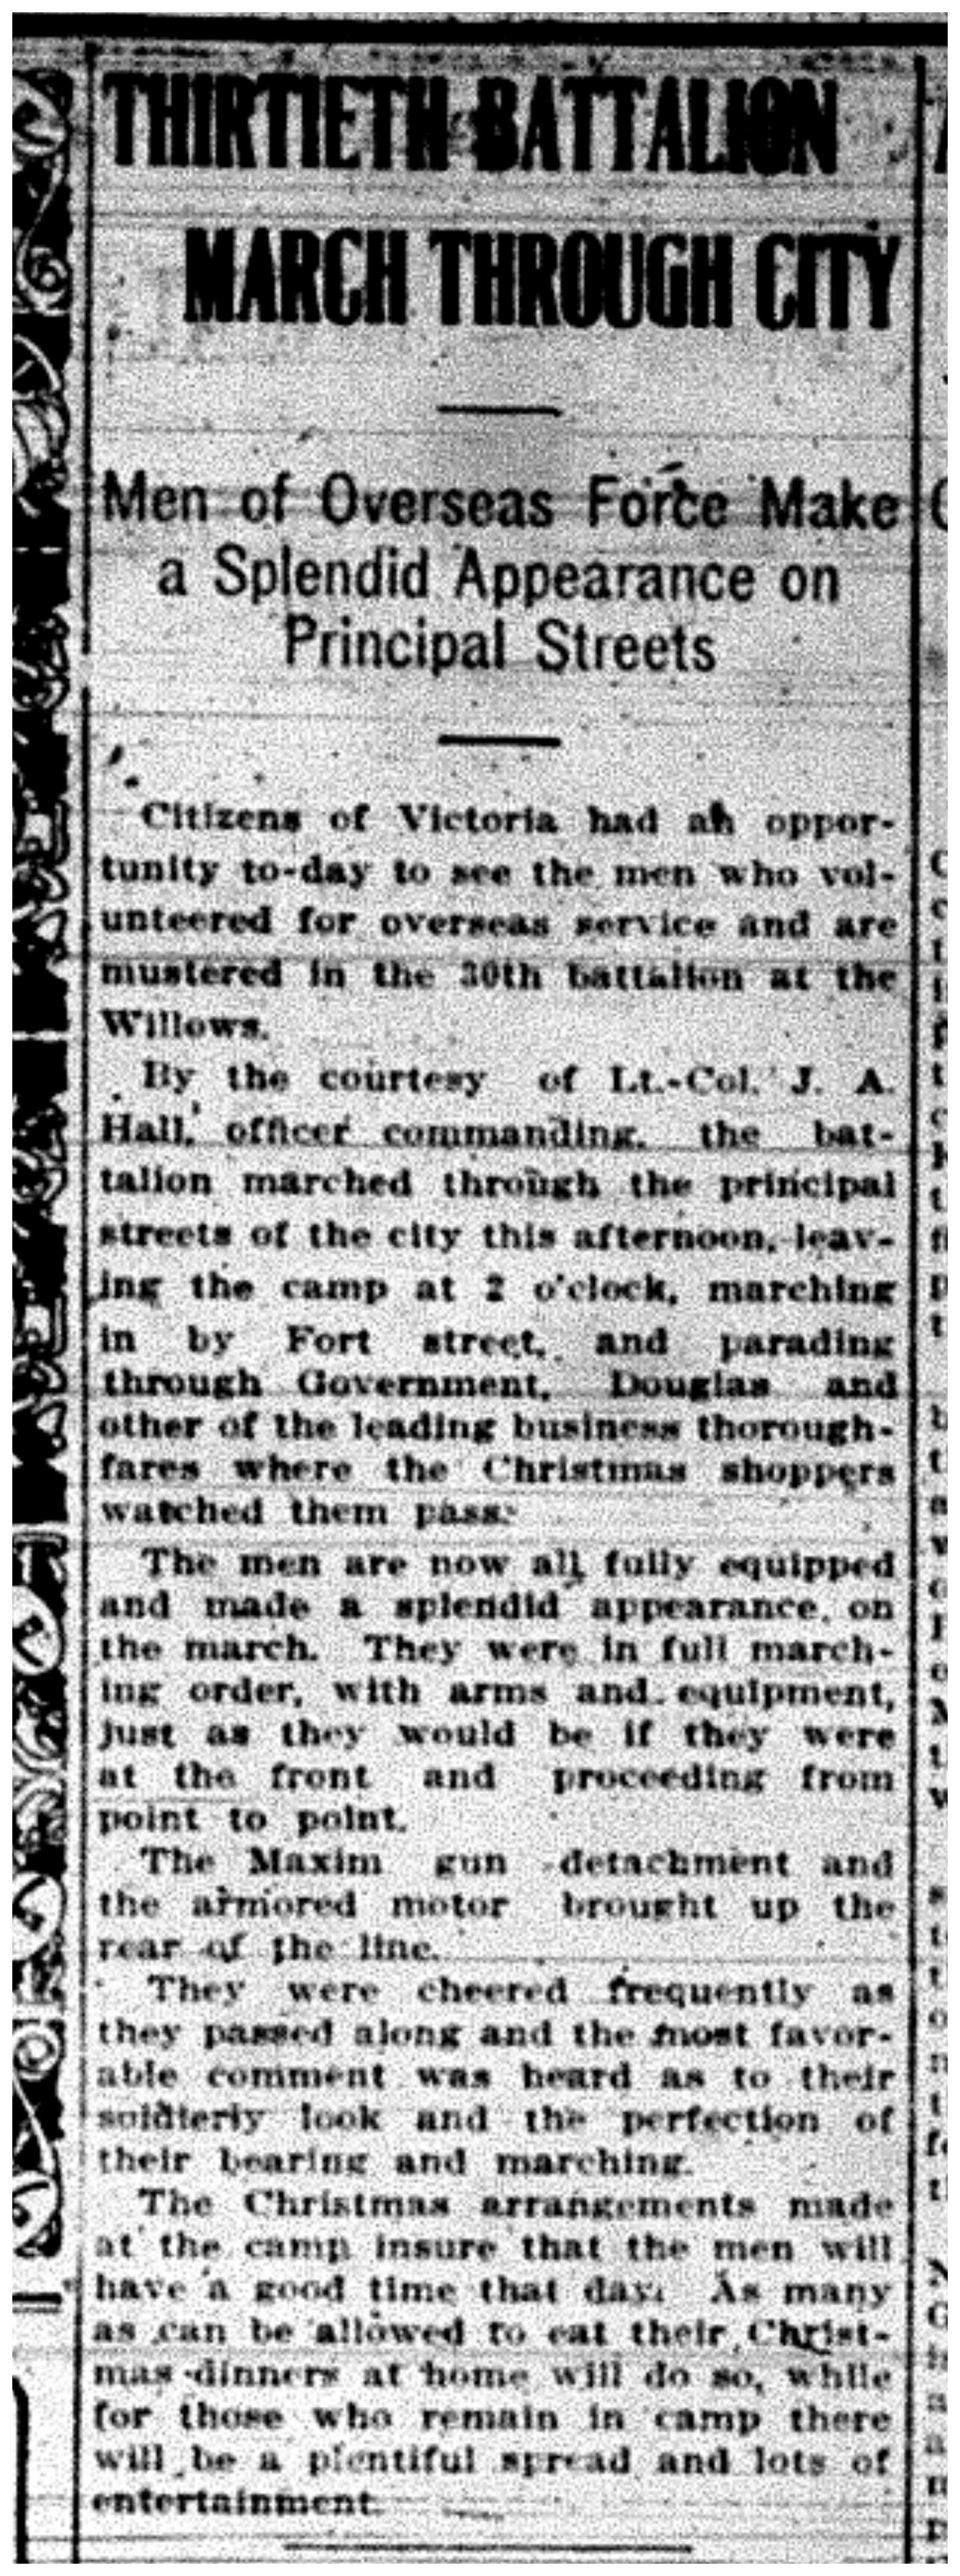 """Thirtieth Battalion March Through City"""